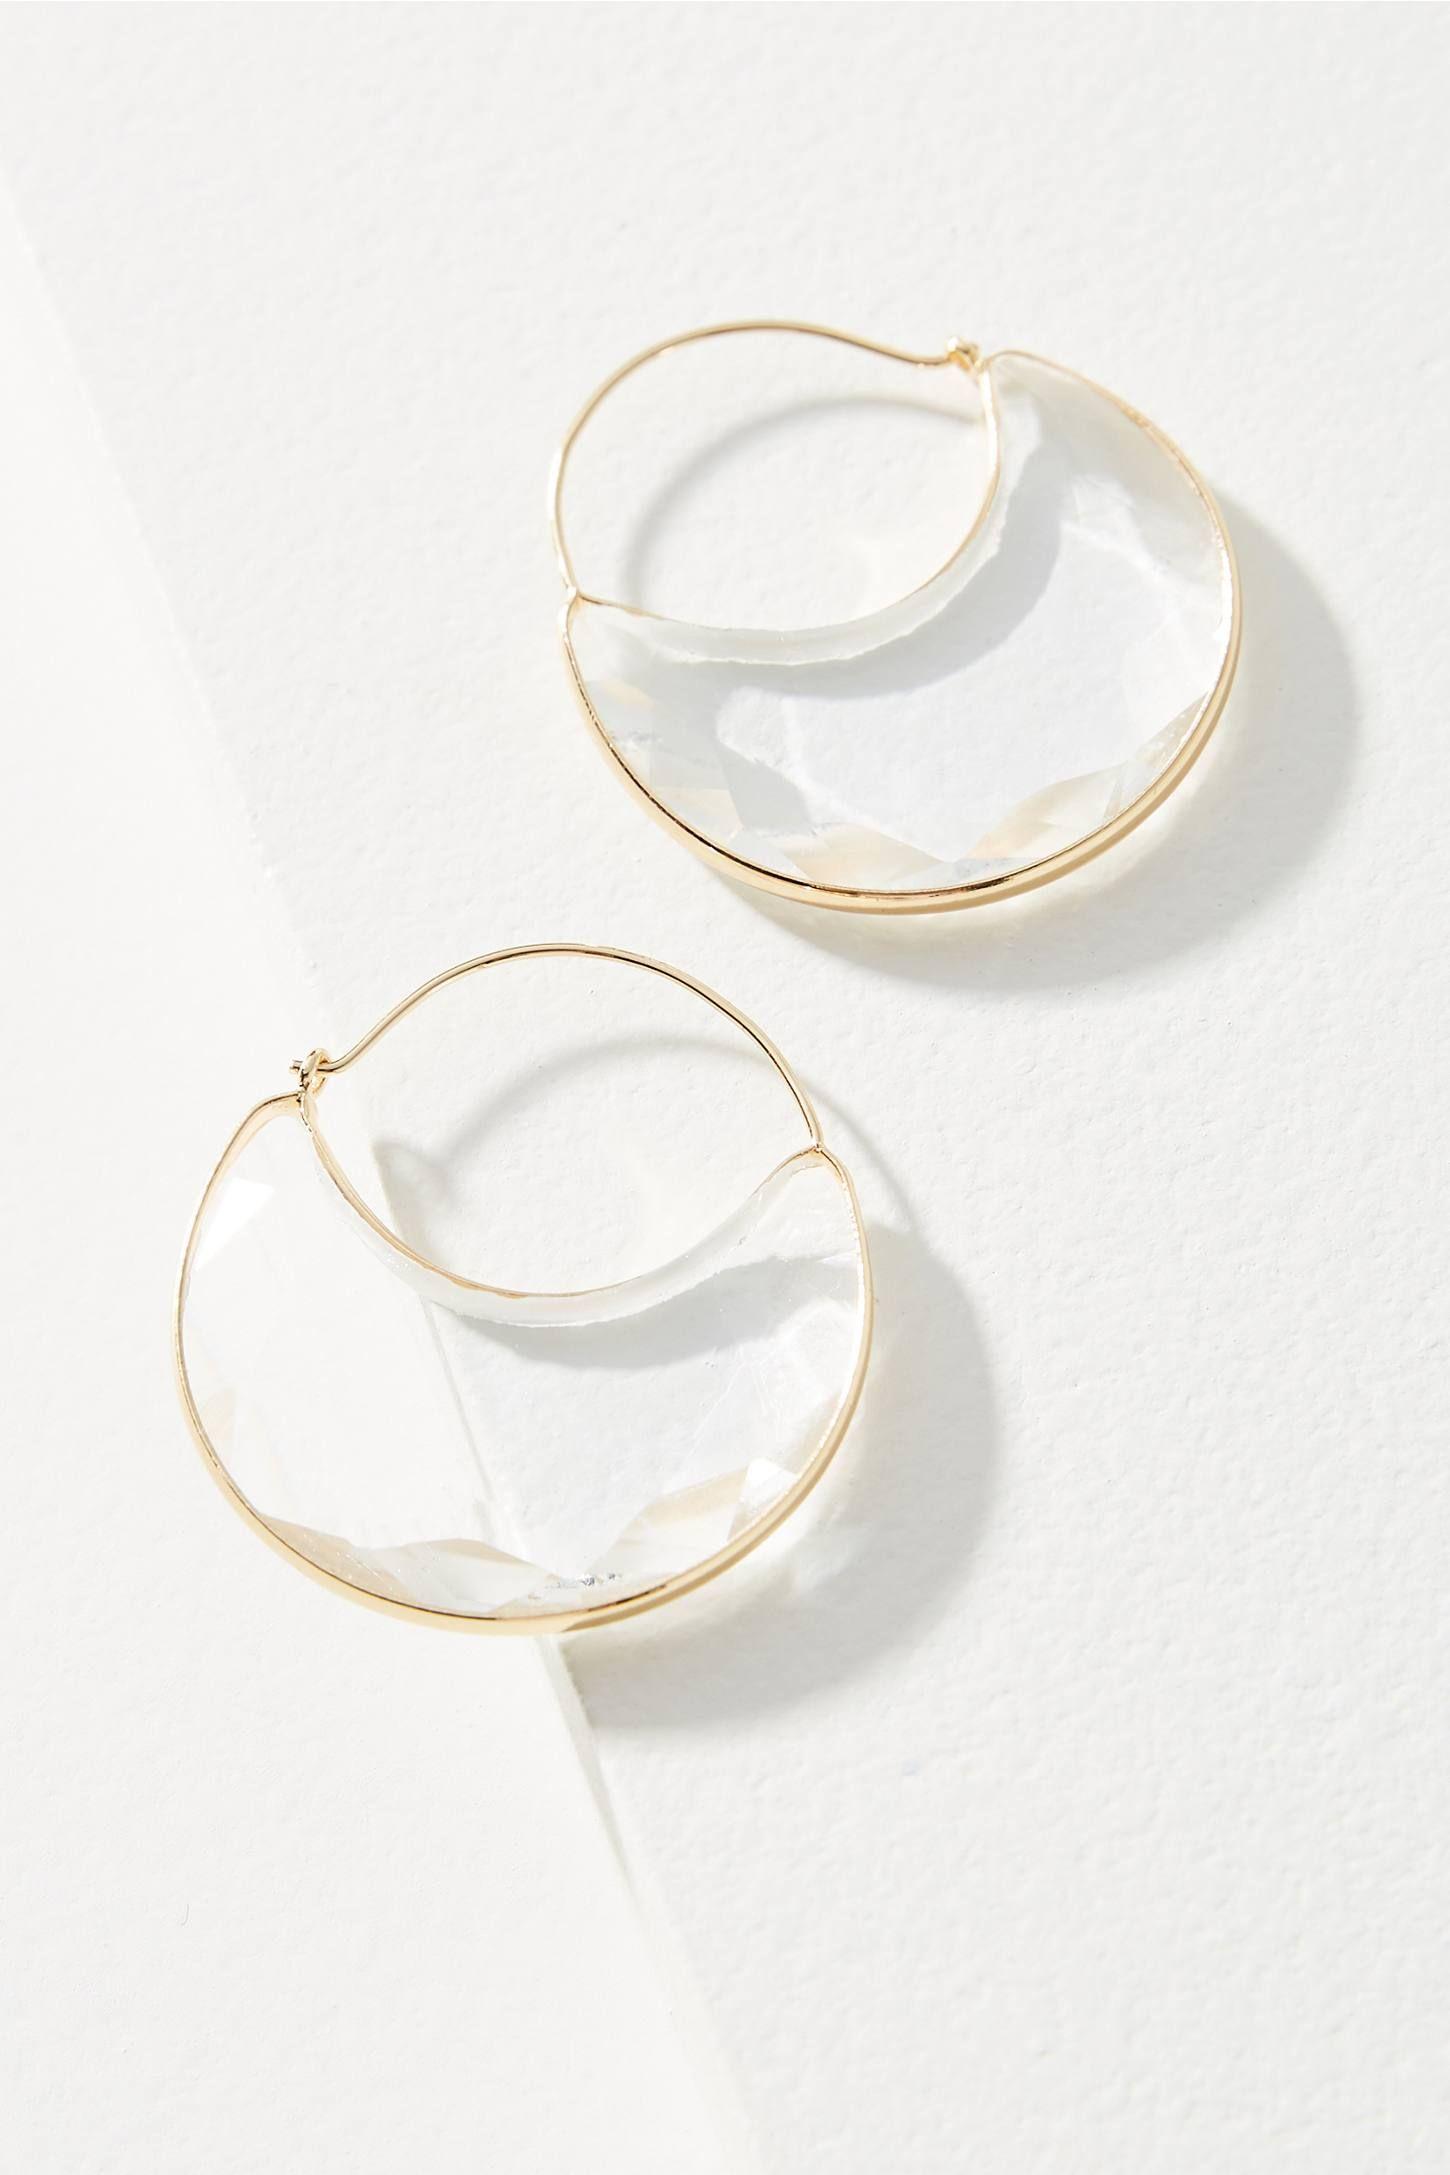 UNUSUAL 925 Silver Pink Moonstone Earrings Xmas Gift For Her Wife Mum Girl Women